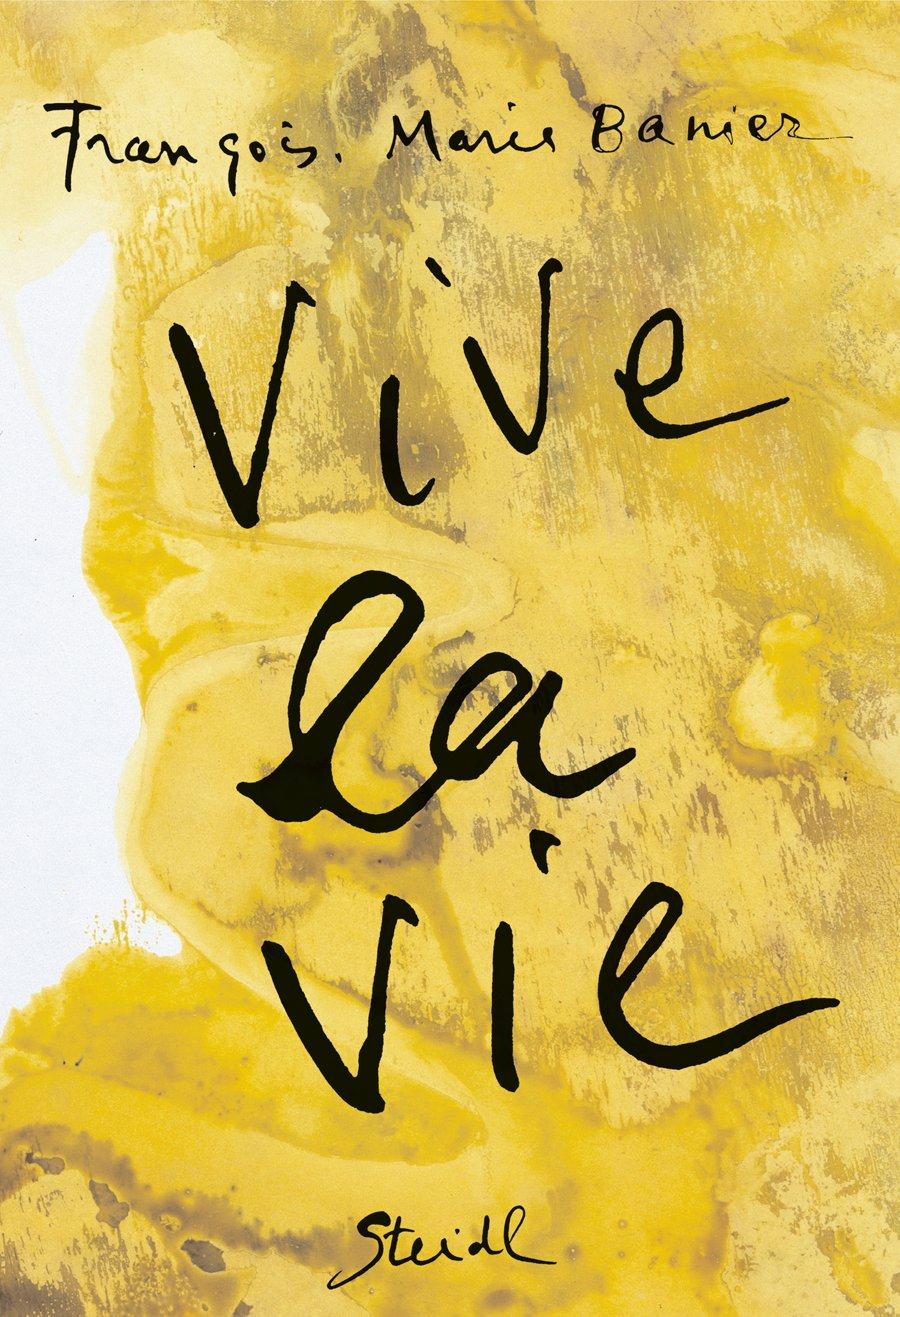 François-Marie Banier: Vive la Vie